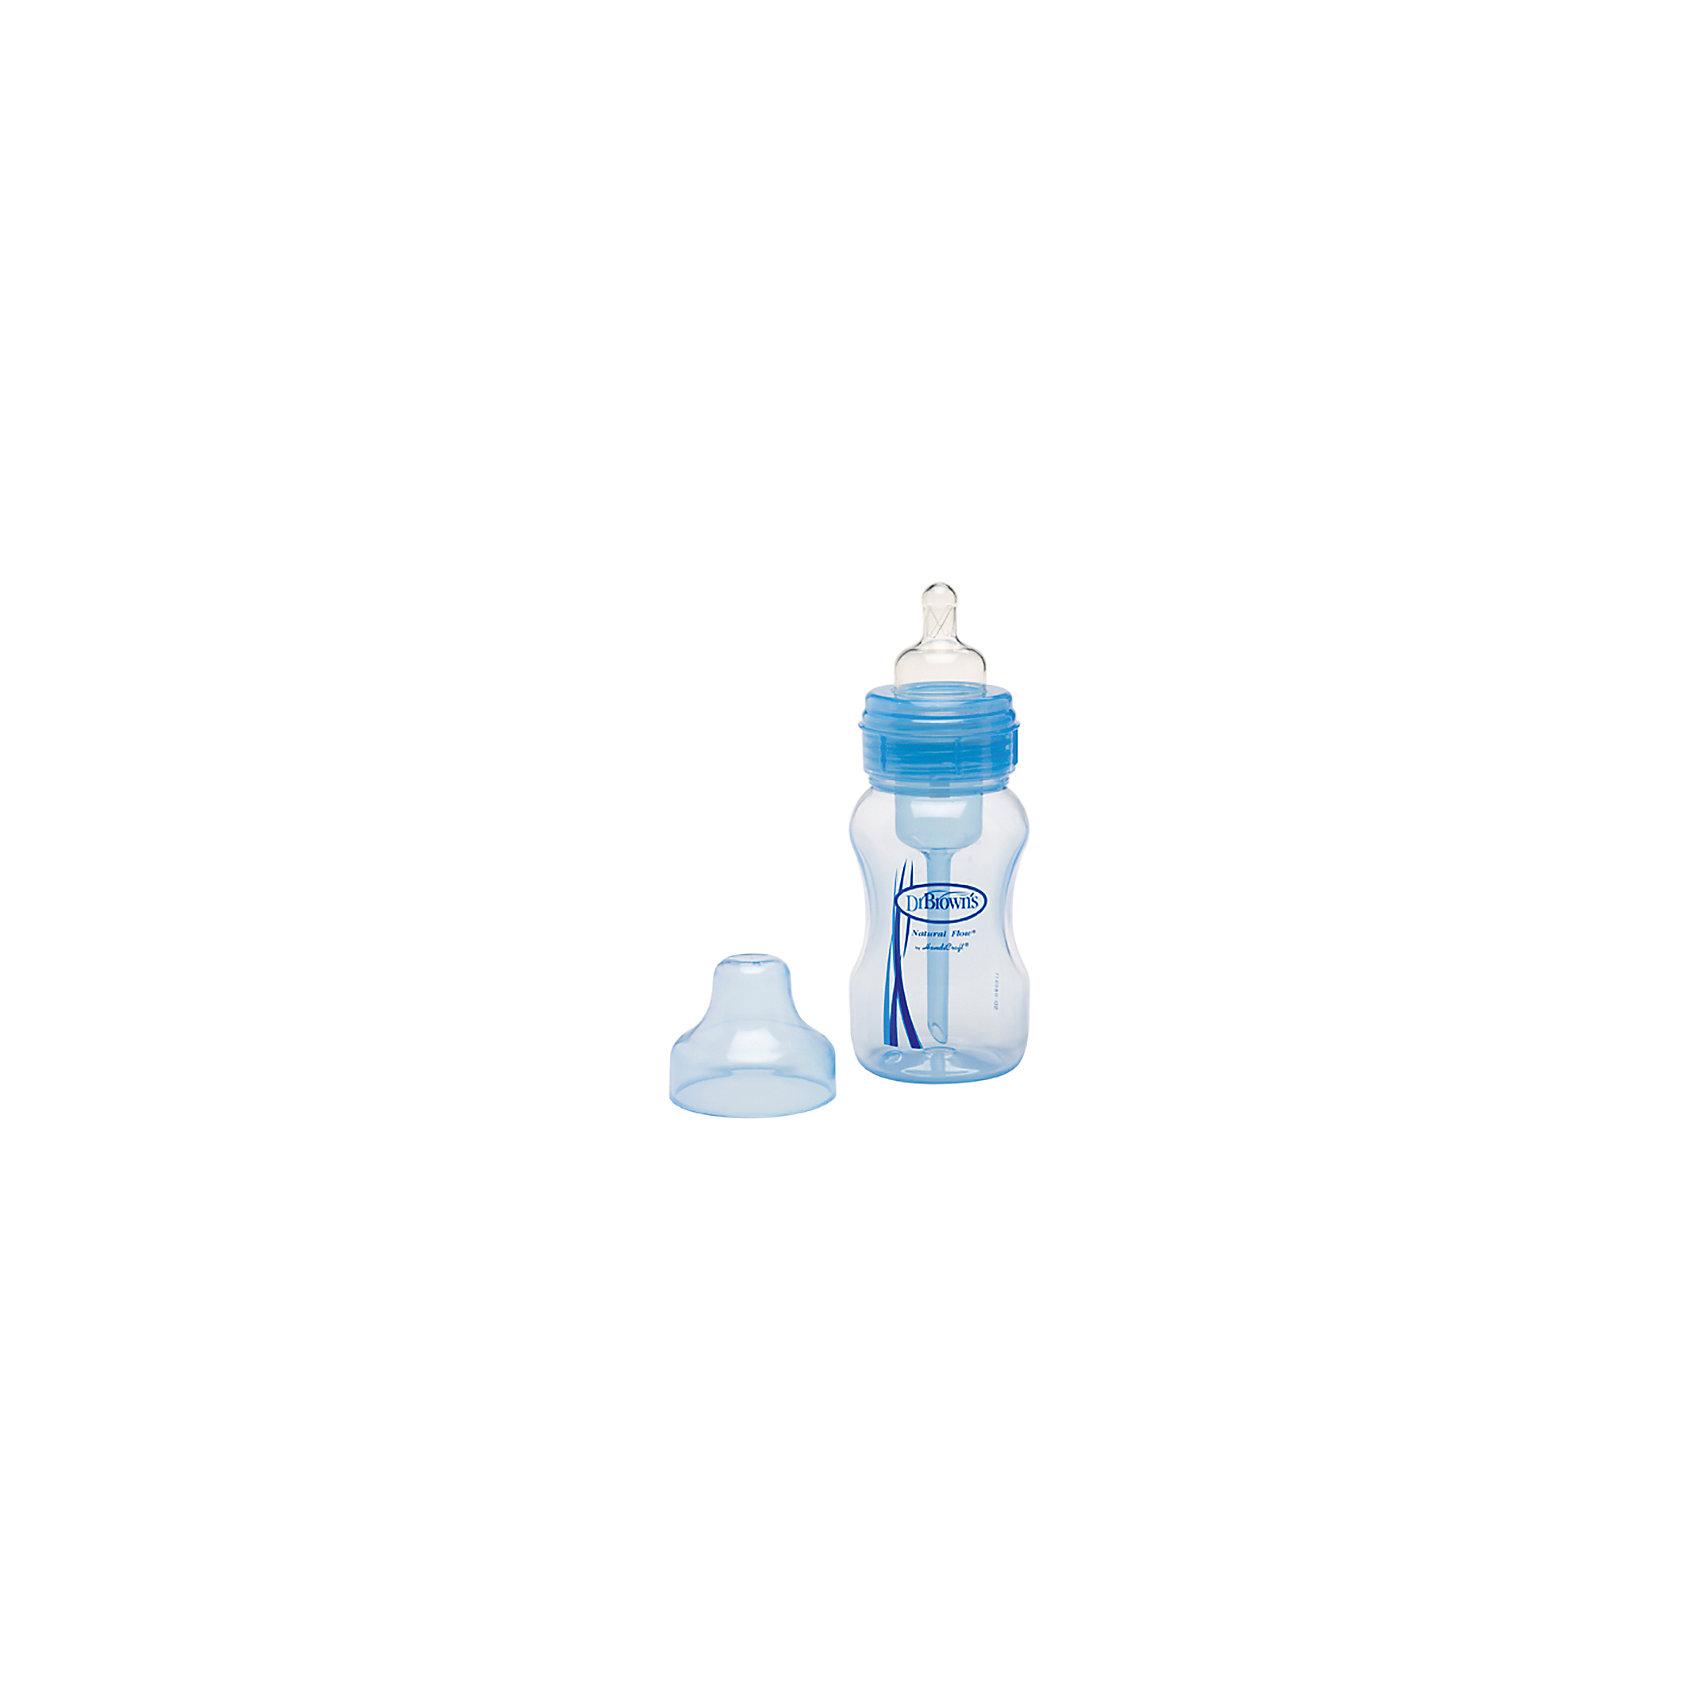 Dr.Brown's Бутылочка с широким горлышком 240 мл, полипропилен, Dr. Brown, синий dr brown бутылочка стандартная 120 мл полипропилен 155